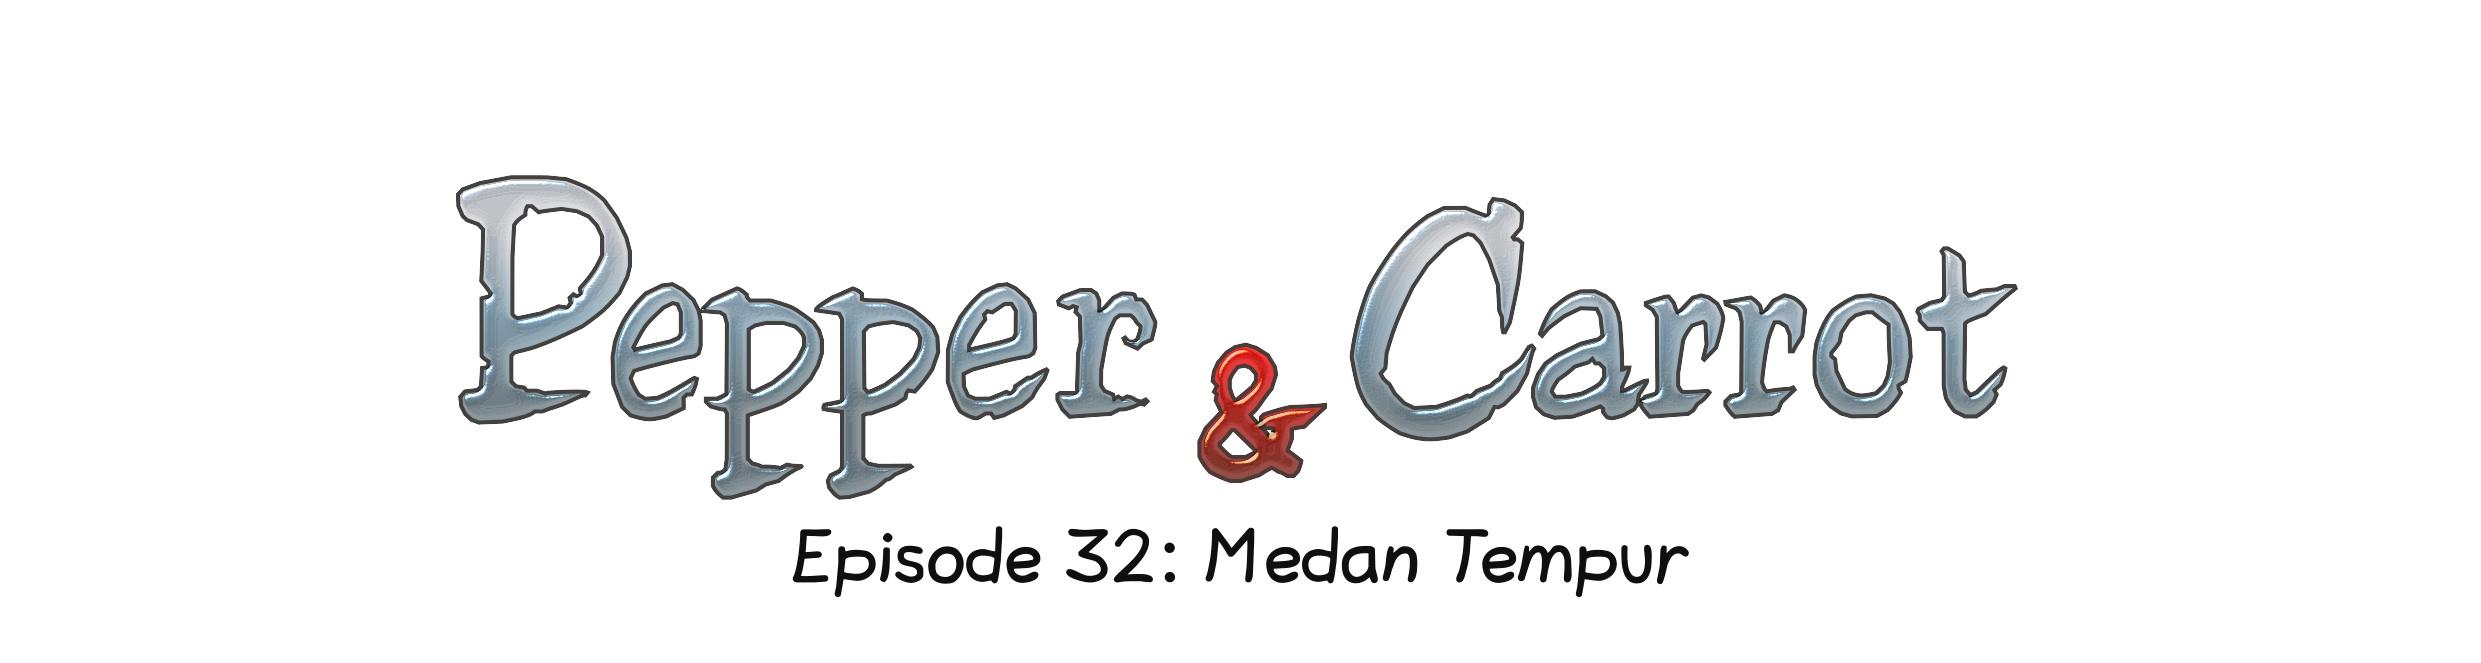 Episode 32: Medan Tempur